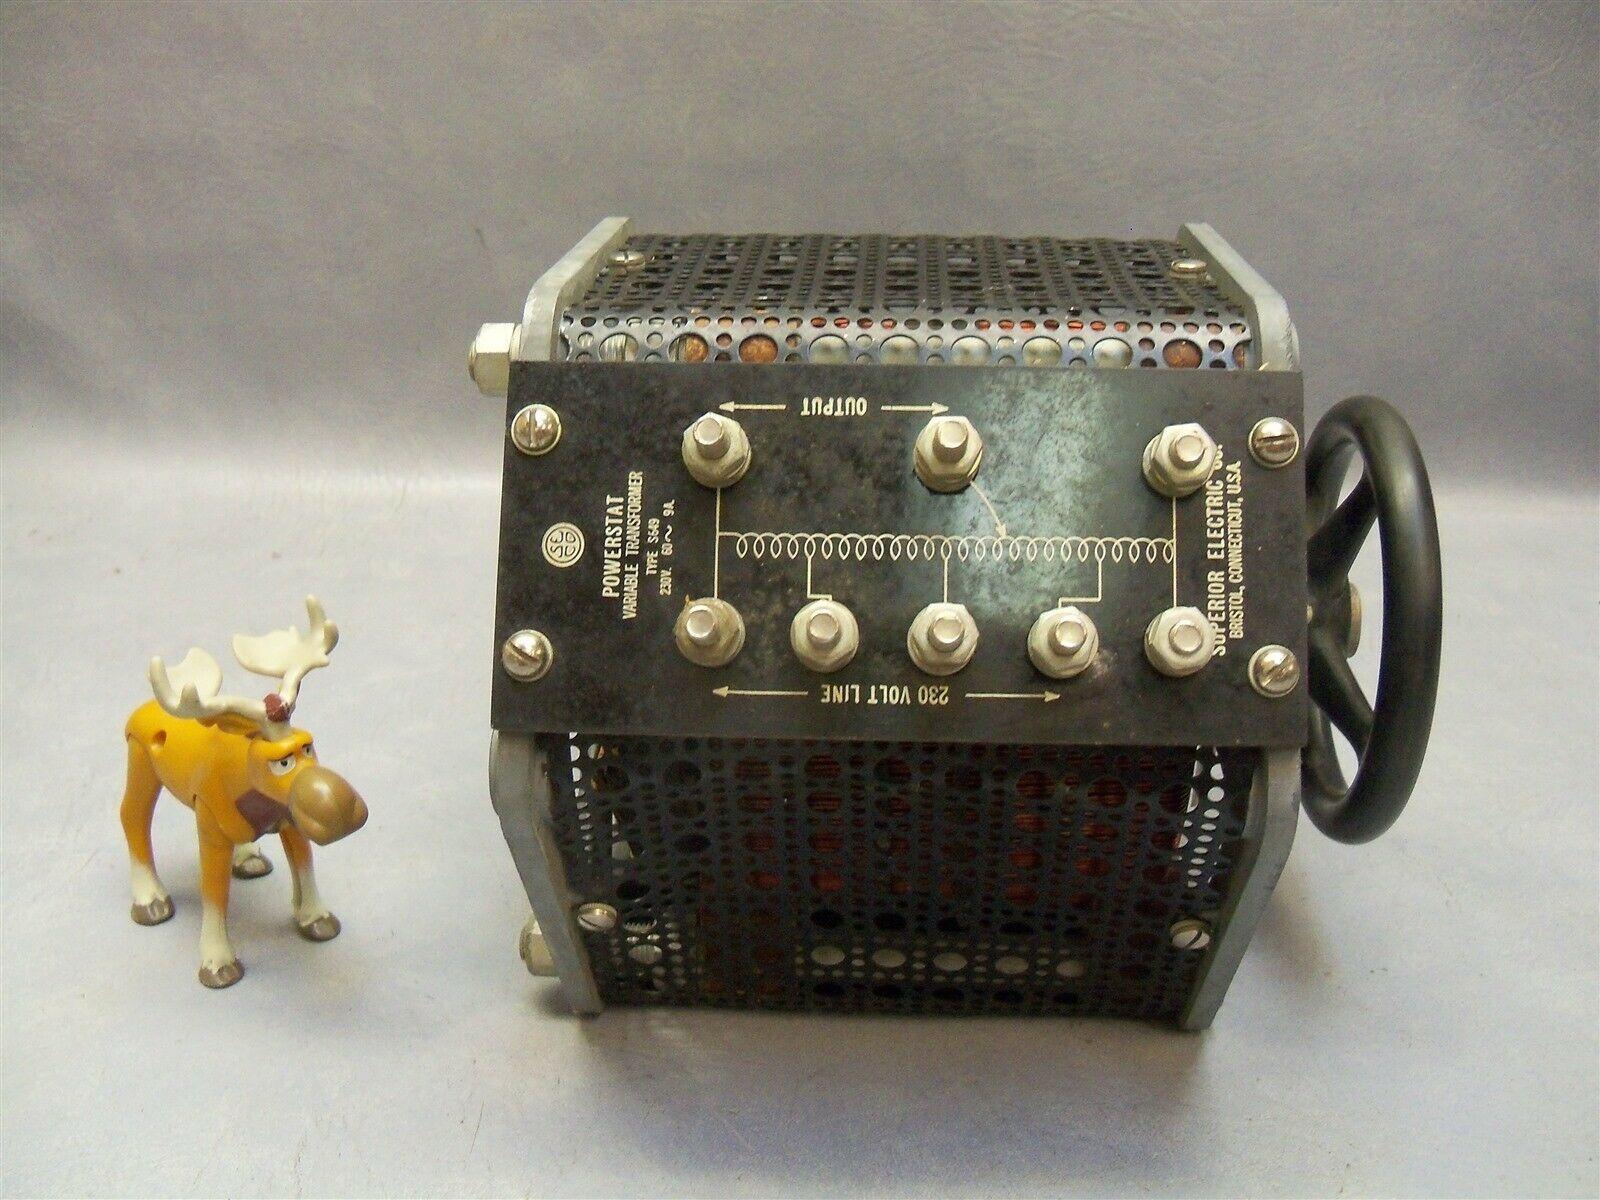 ROCKFORD DYNATORQ 15-50-1 CONTROL PANEL W// STACO ENERGY TYPE 221 AUTOTRANSFORMER